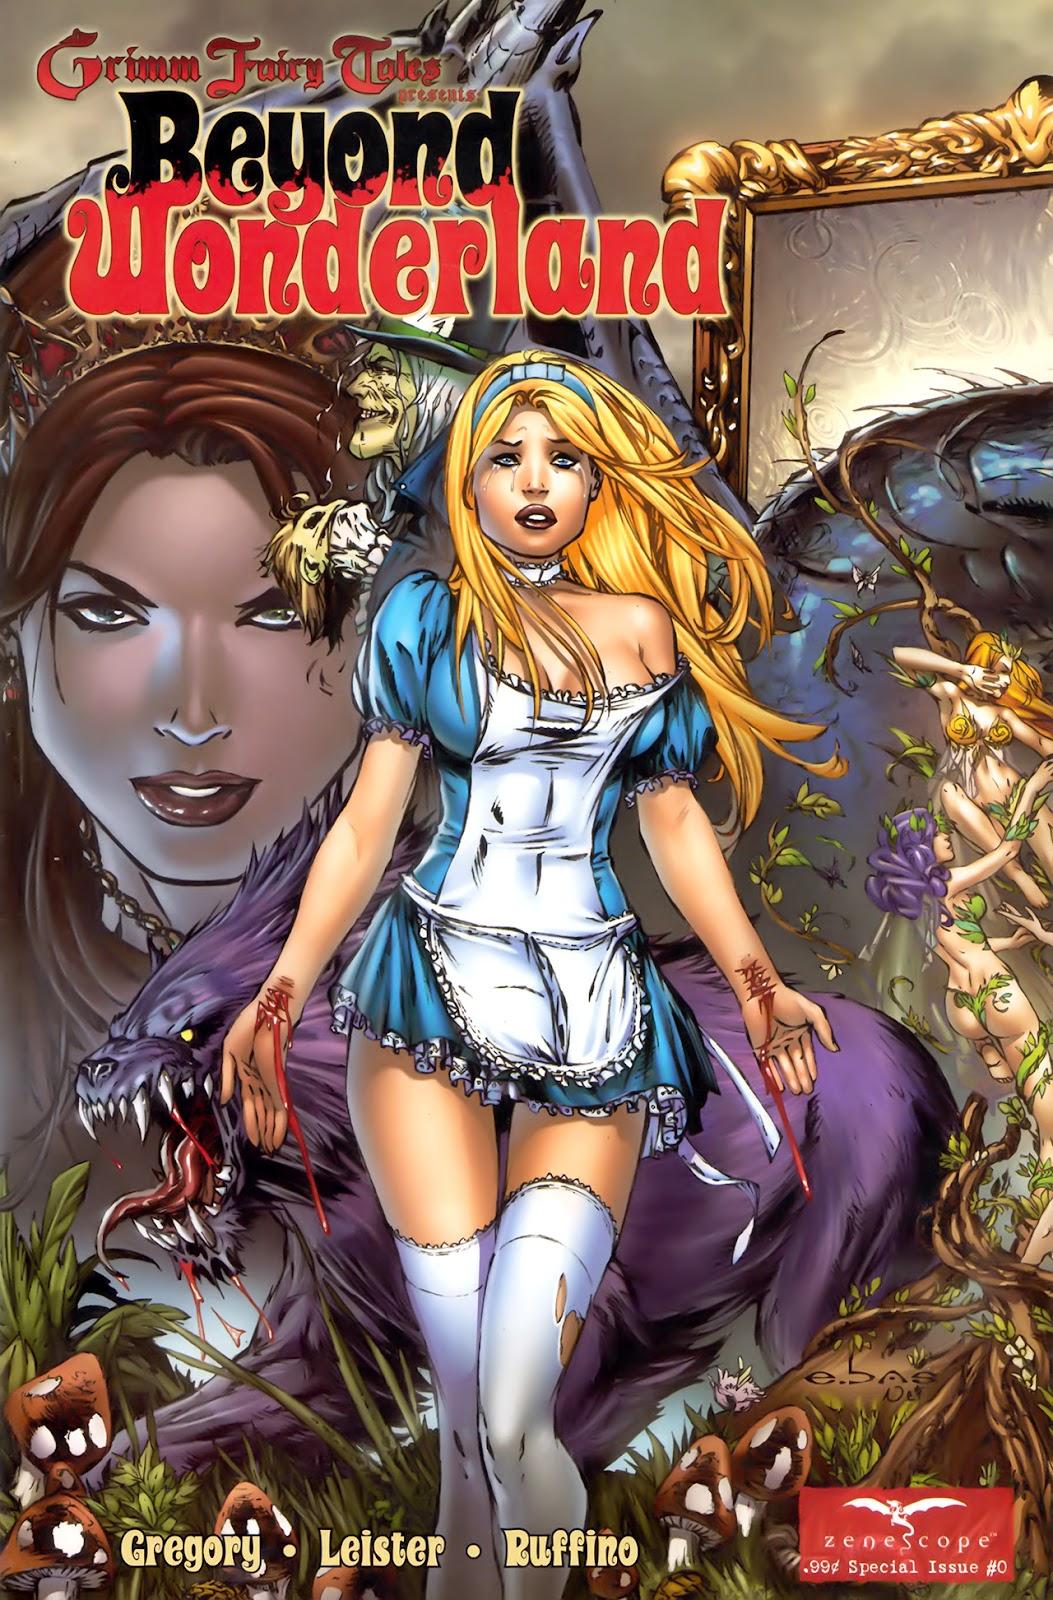 Grimm Fairy Tales: Beyond Wonderland issue 0 - Page 1